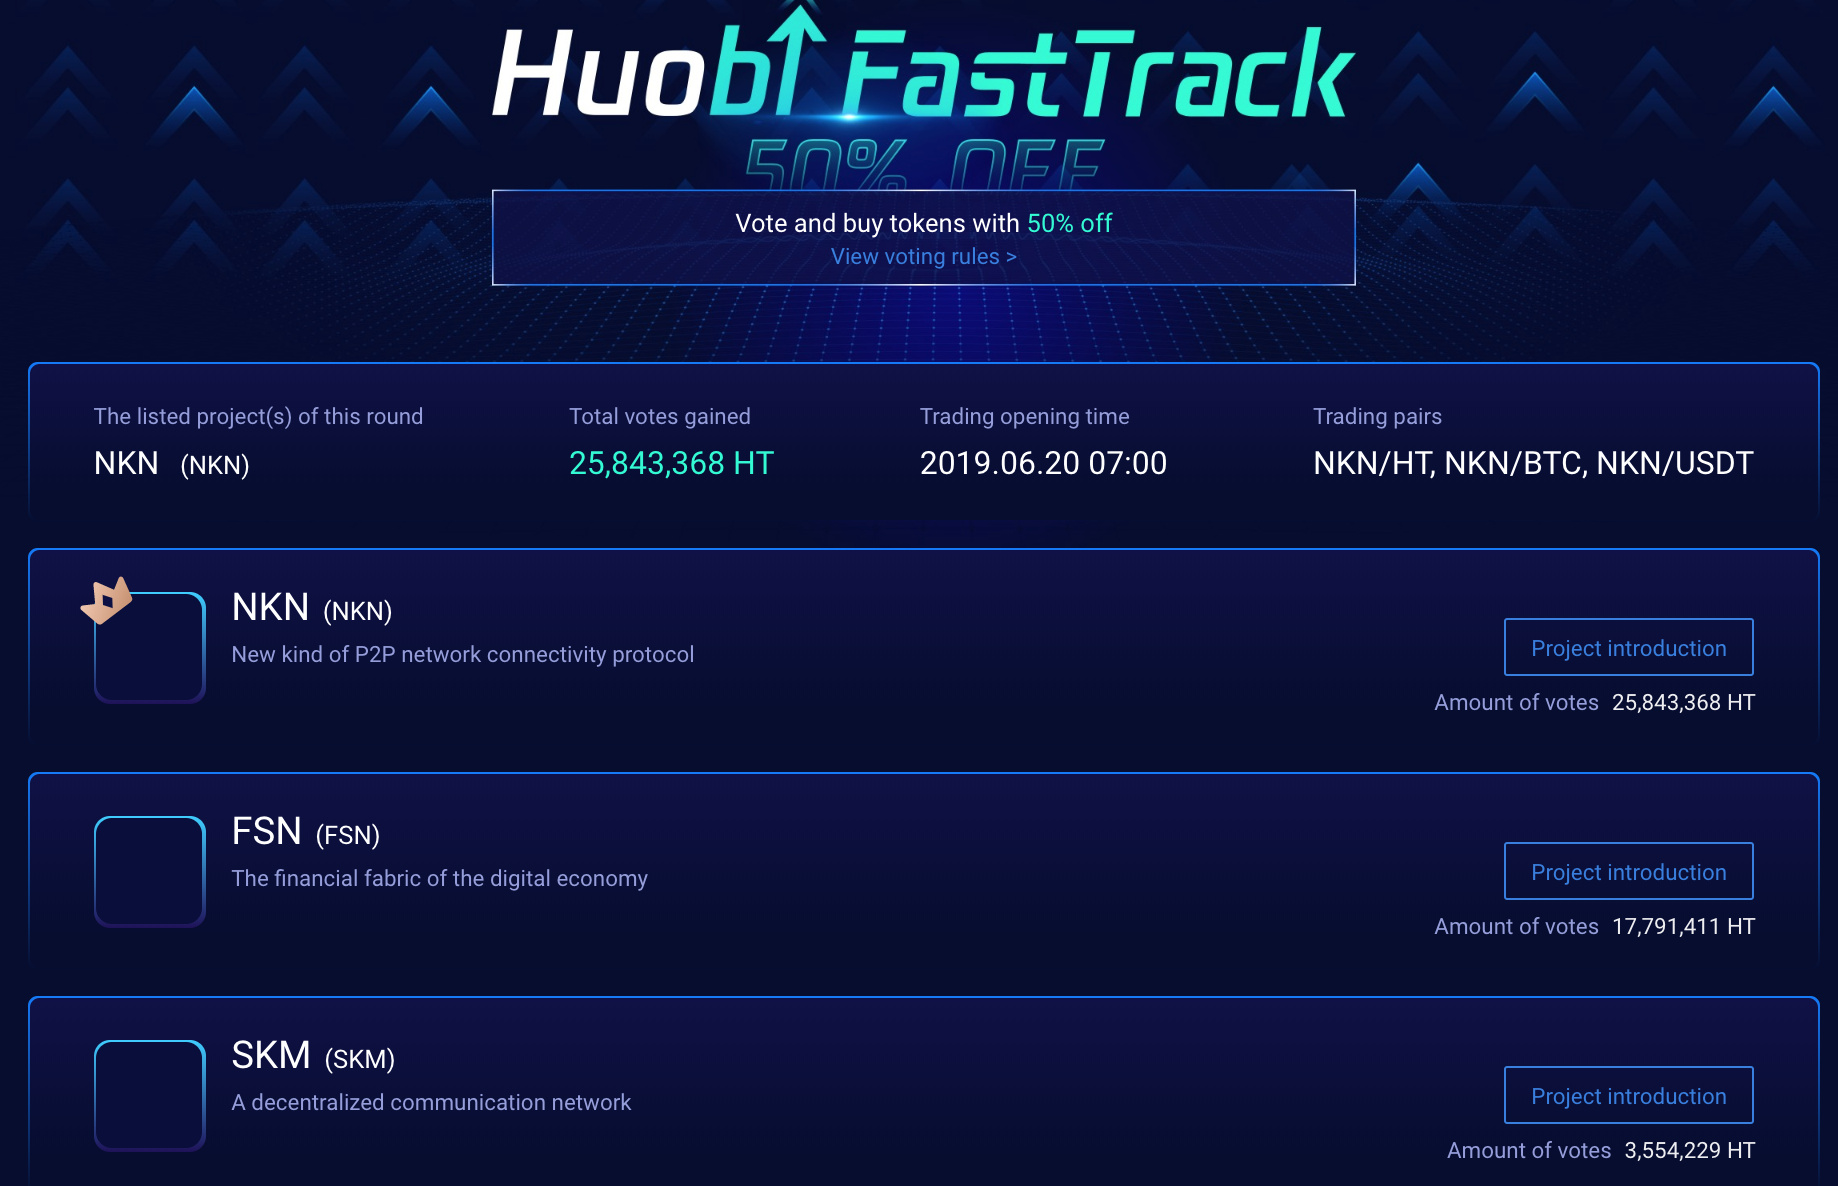 Huobi-NKN-FastTrack